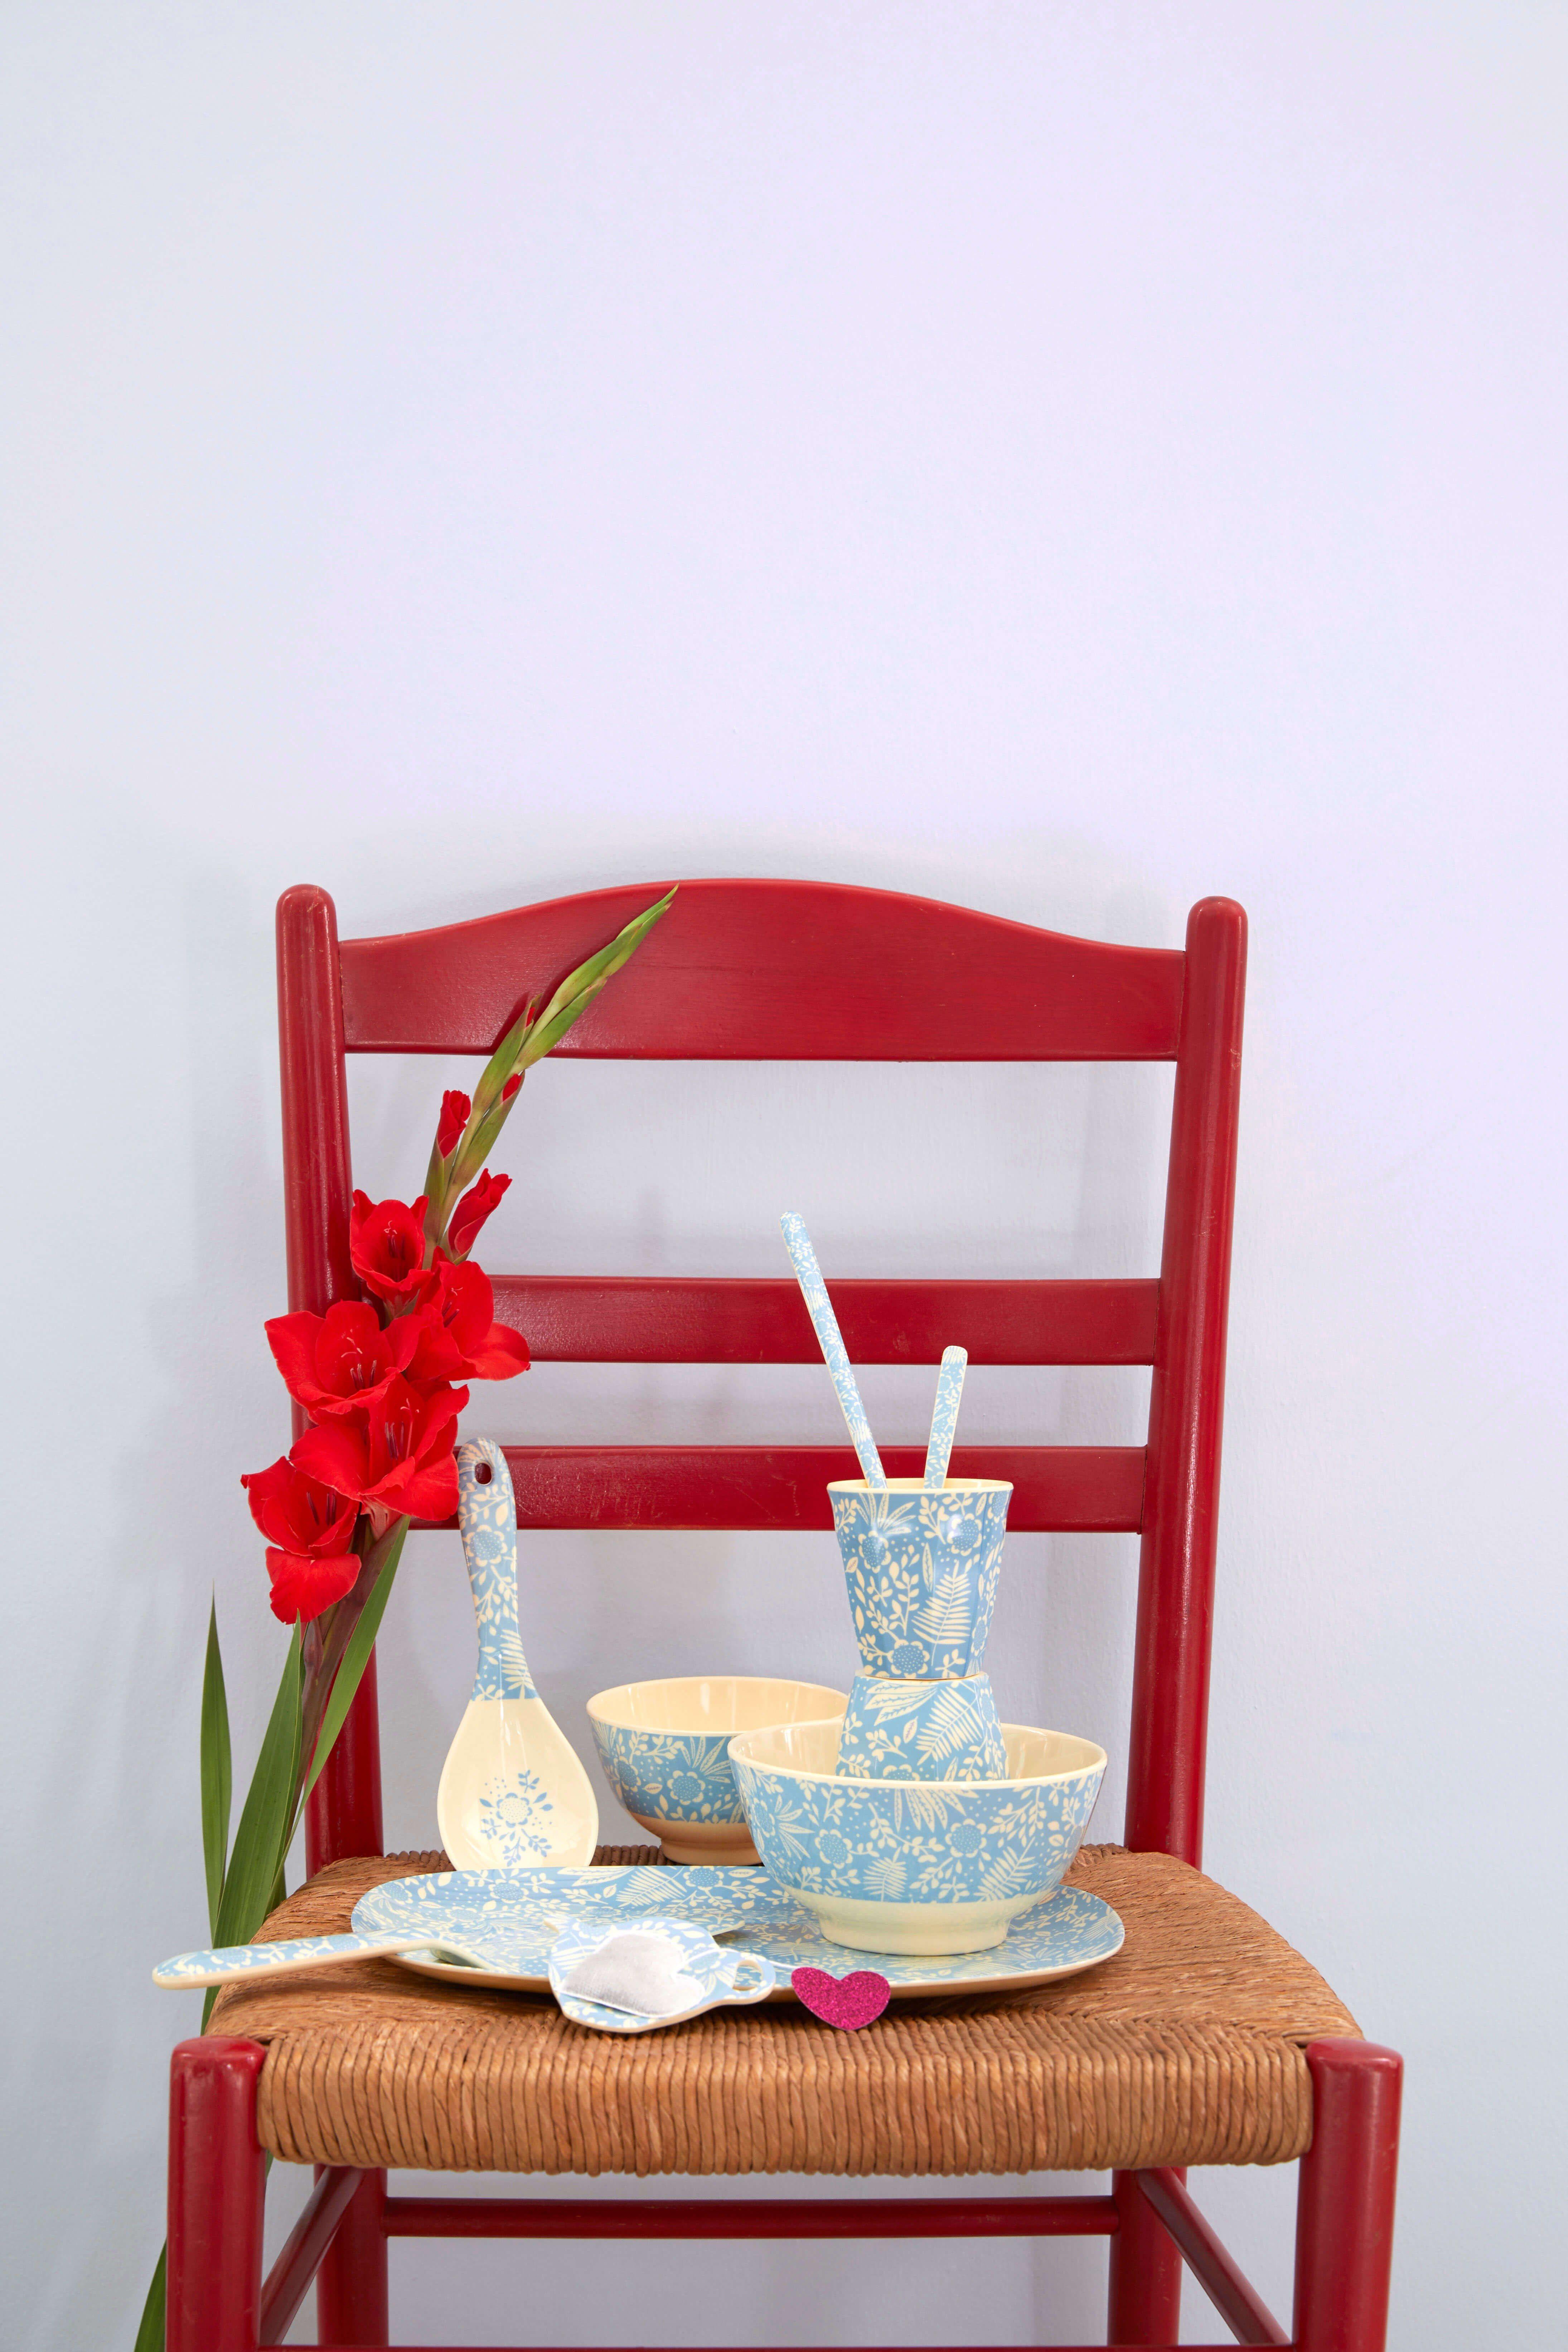 Löffel lang - Melamine Latte Spoon - Blue Fern and Flower Print - rice